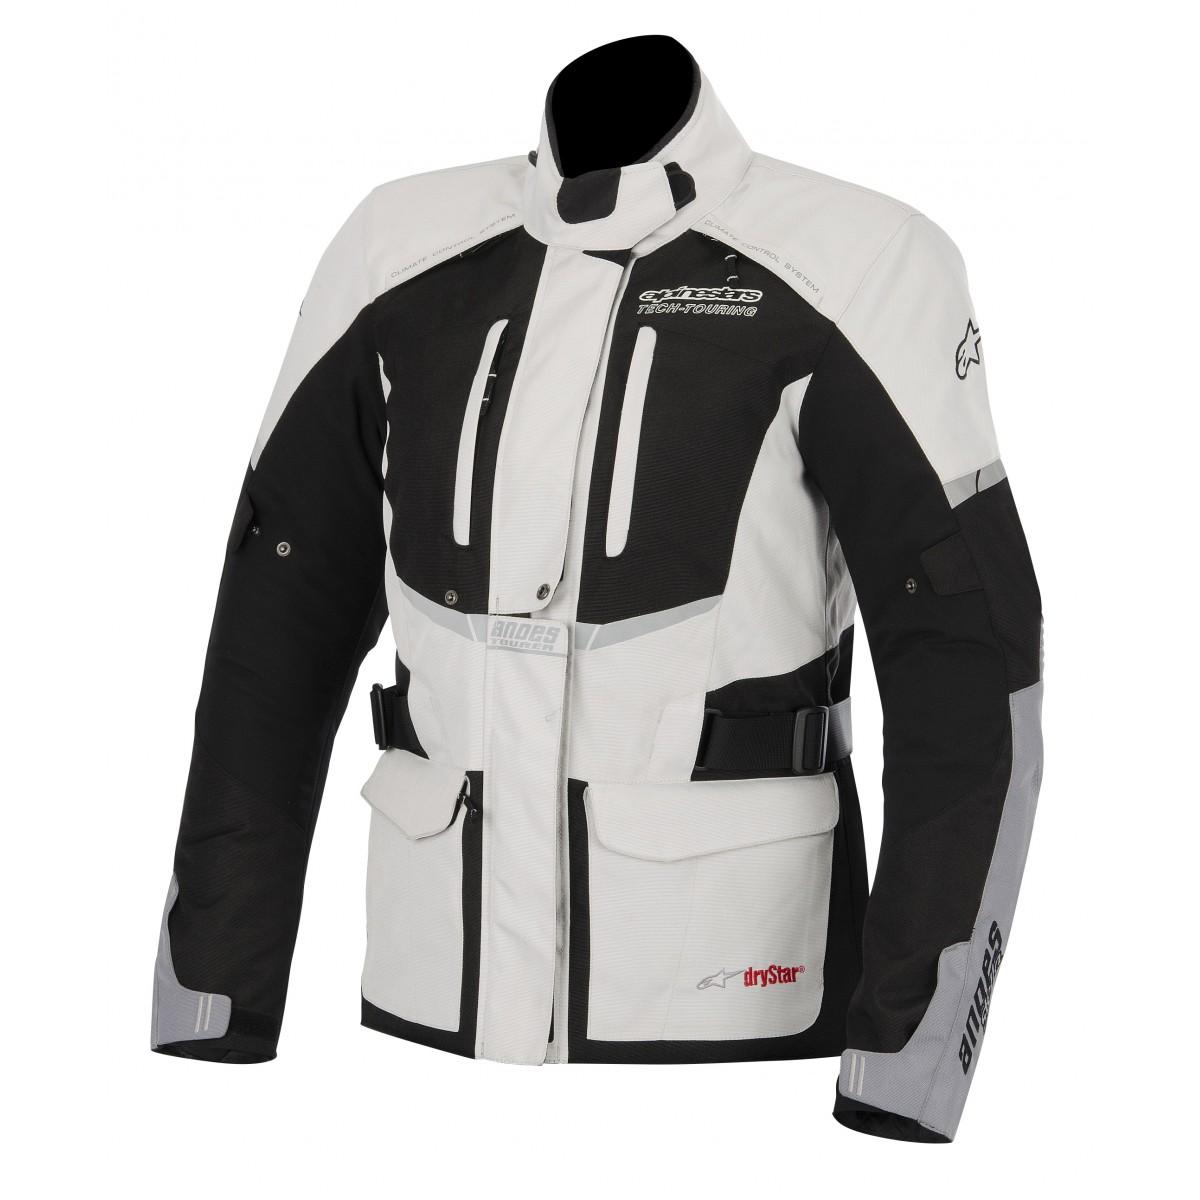 Jaqueta Alpinestars Stella Andes Drystar® WP Cinza Claro/ Feminina para Big Trail  - Super Bike - Loja Oficial Alpinestars